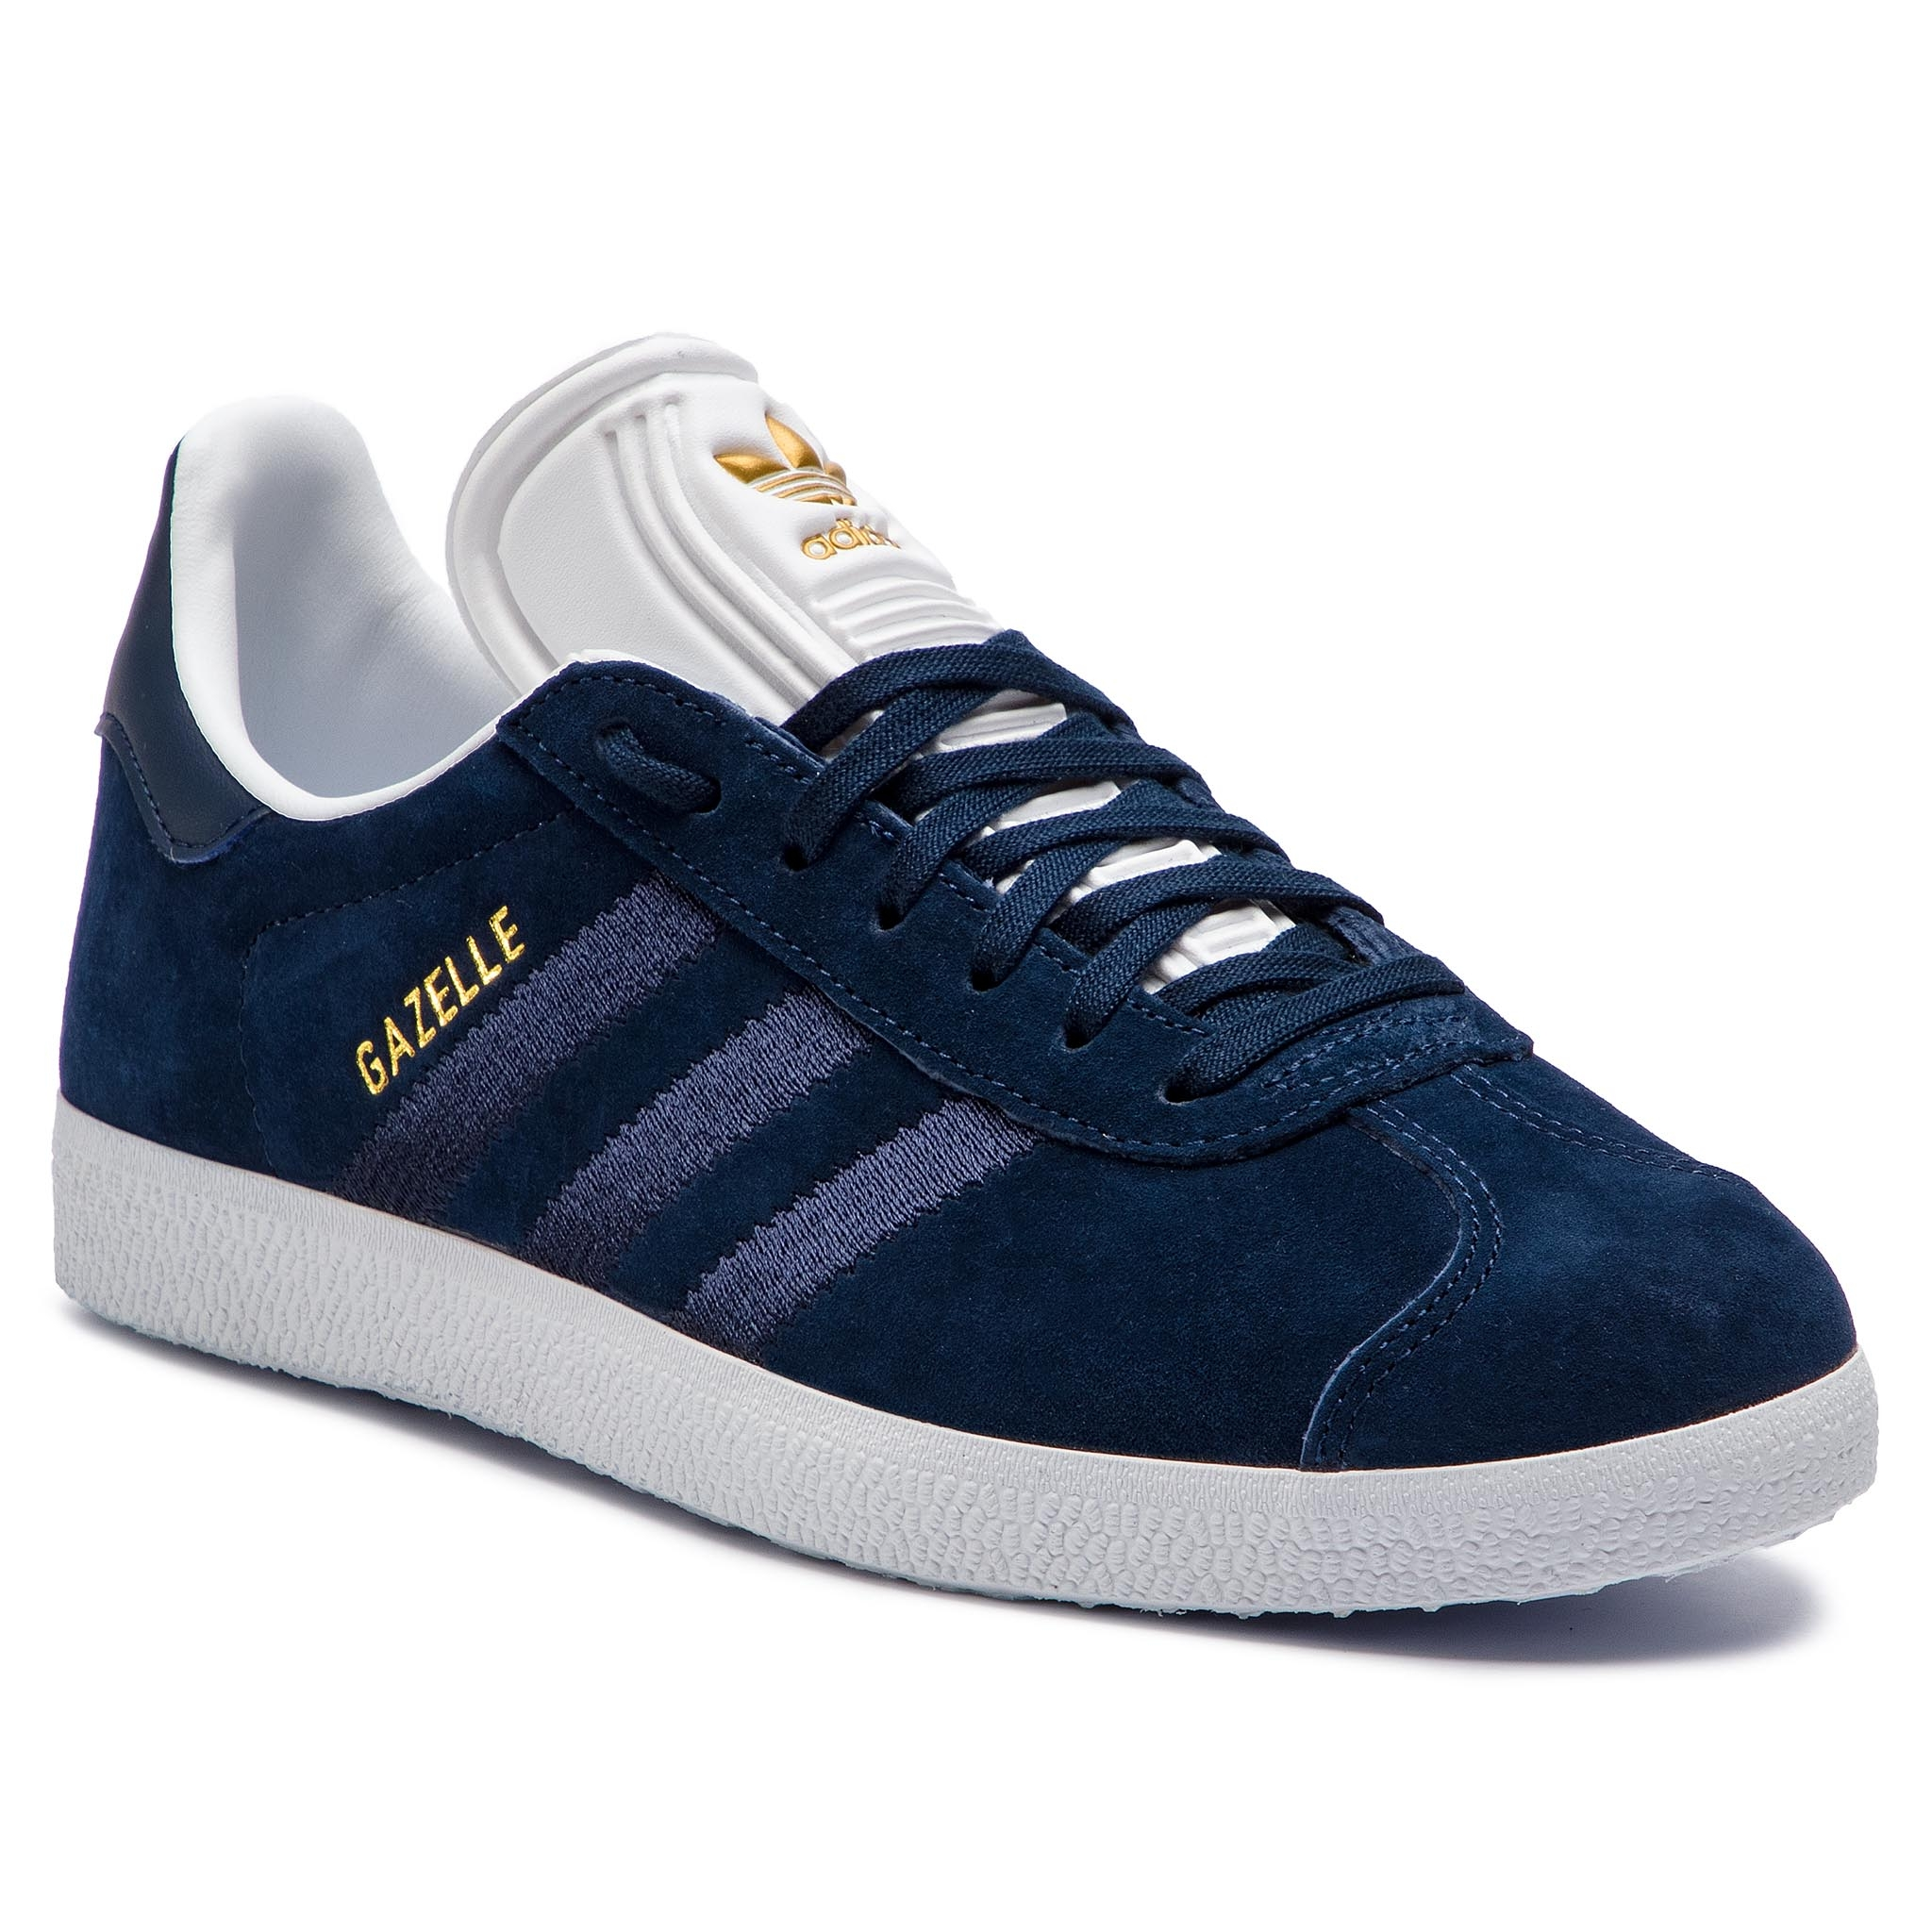 sports shoes 6e094 592e5 Pantofi adidas - Gazelle W CG6058 ConavyConavyFtwwht. Nou Pantofi adidas  - Gazelle W CG6058 ConavyConavyFtwwht